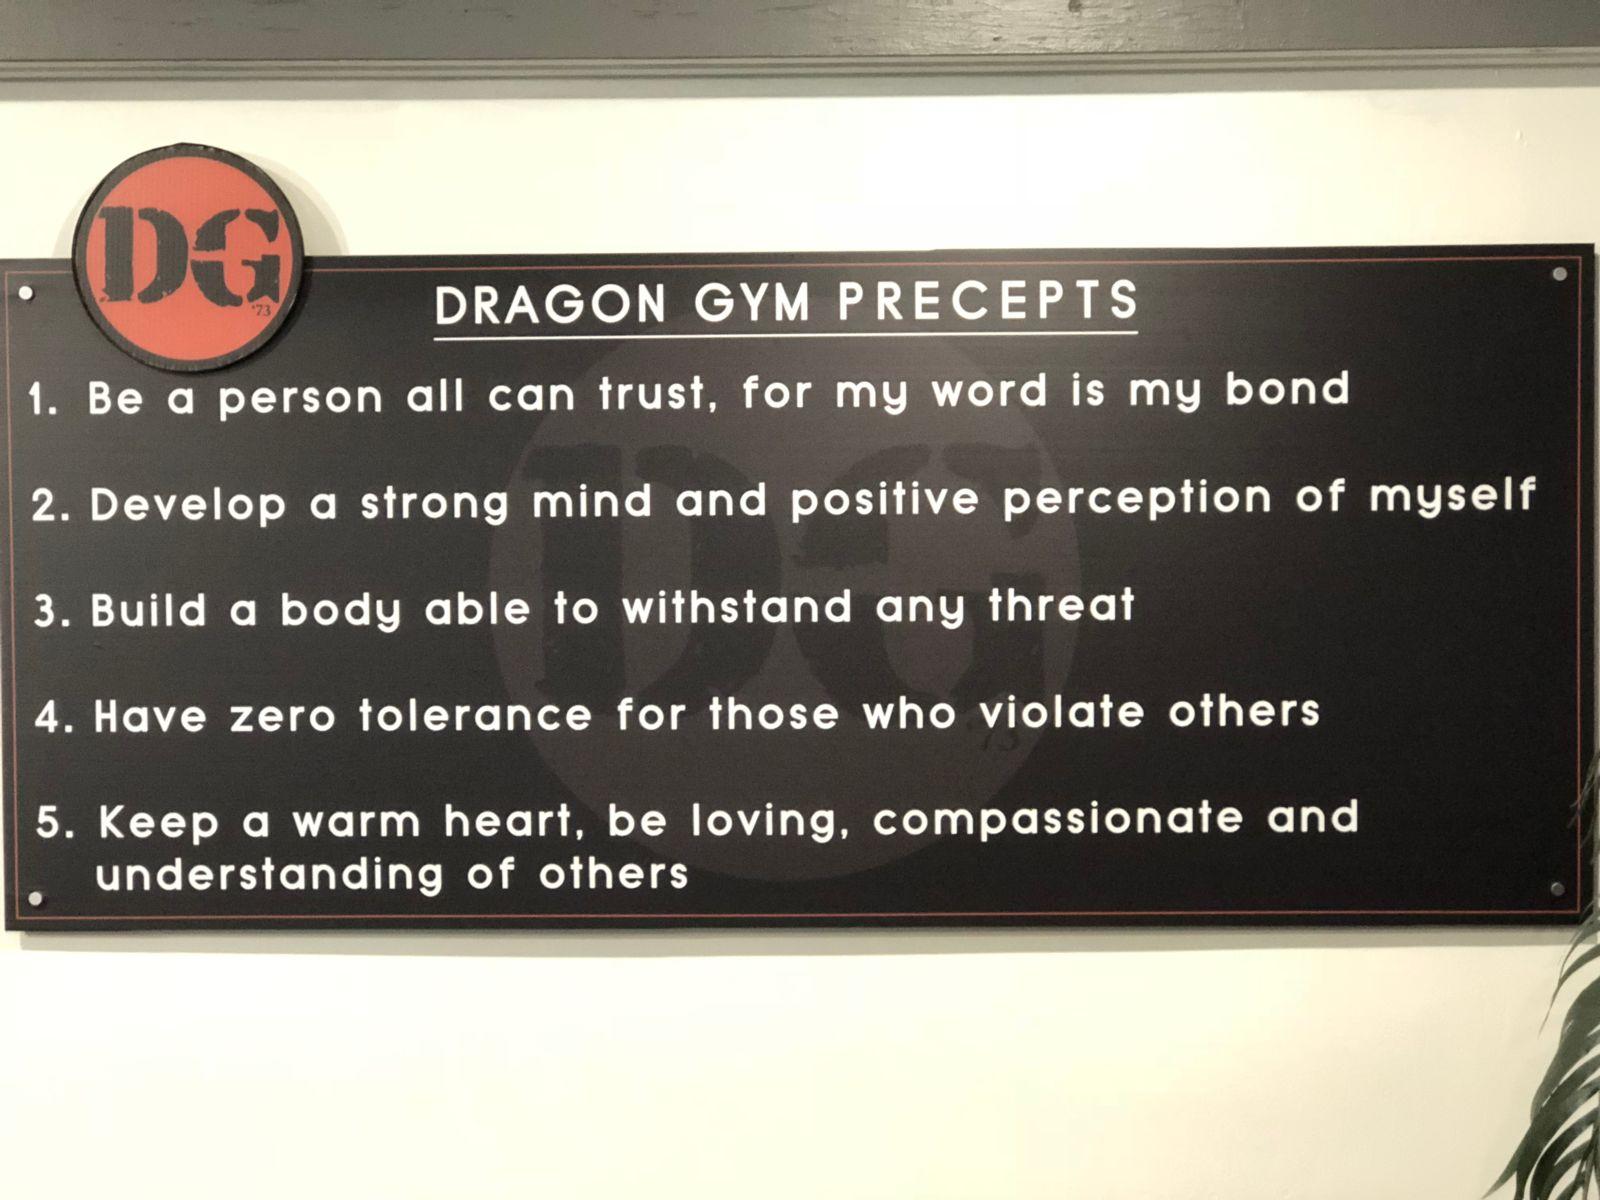 Dragon Gym Martial Arts and Fitness Precepts